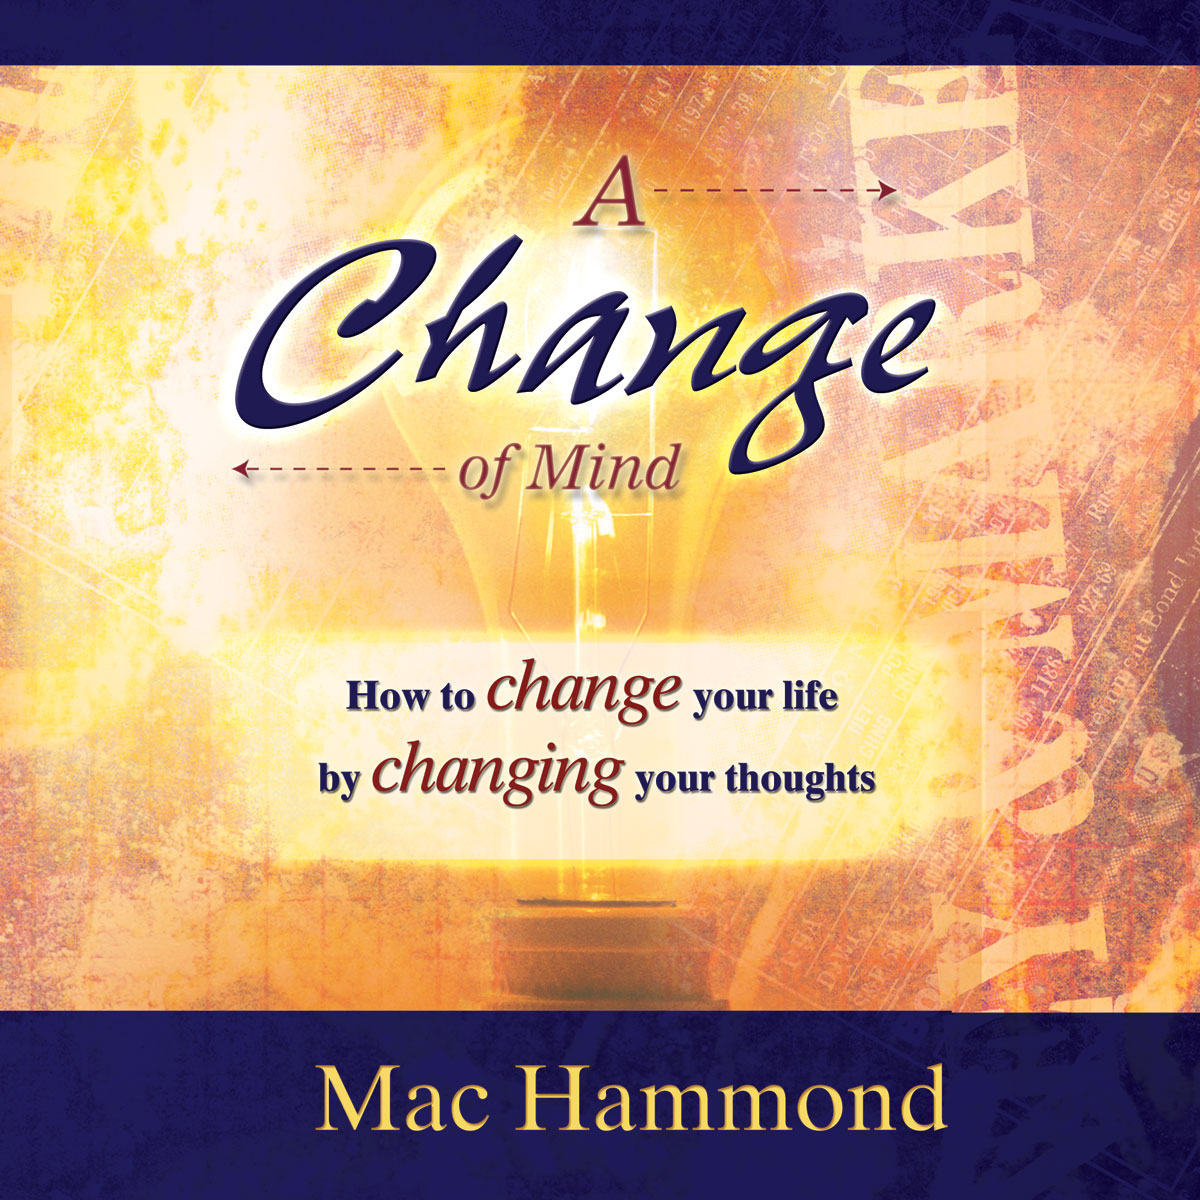 A Change of Mind by Mac Hammond